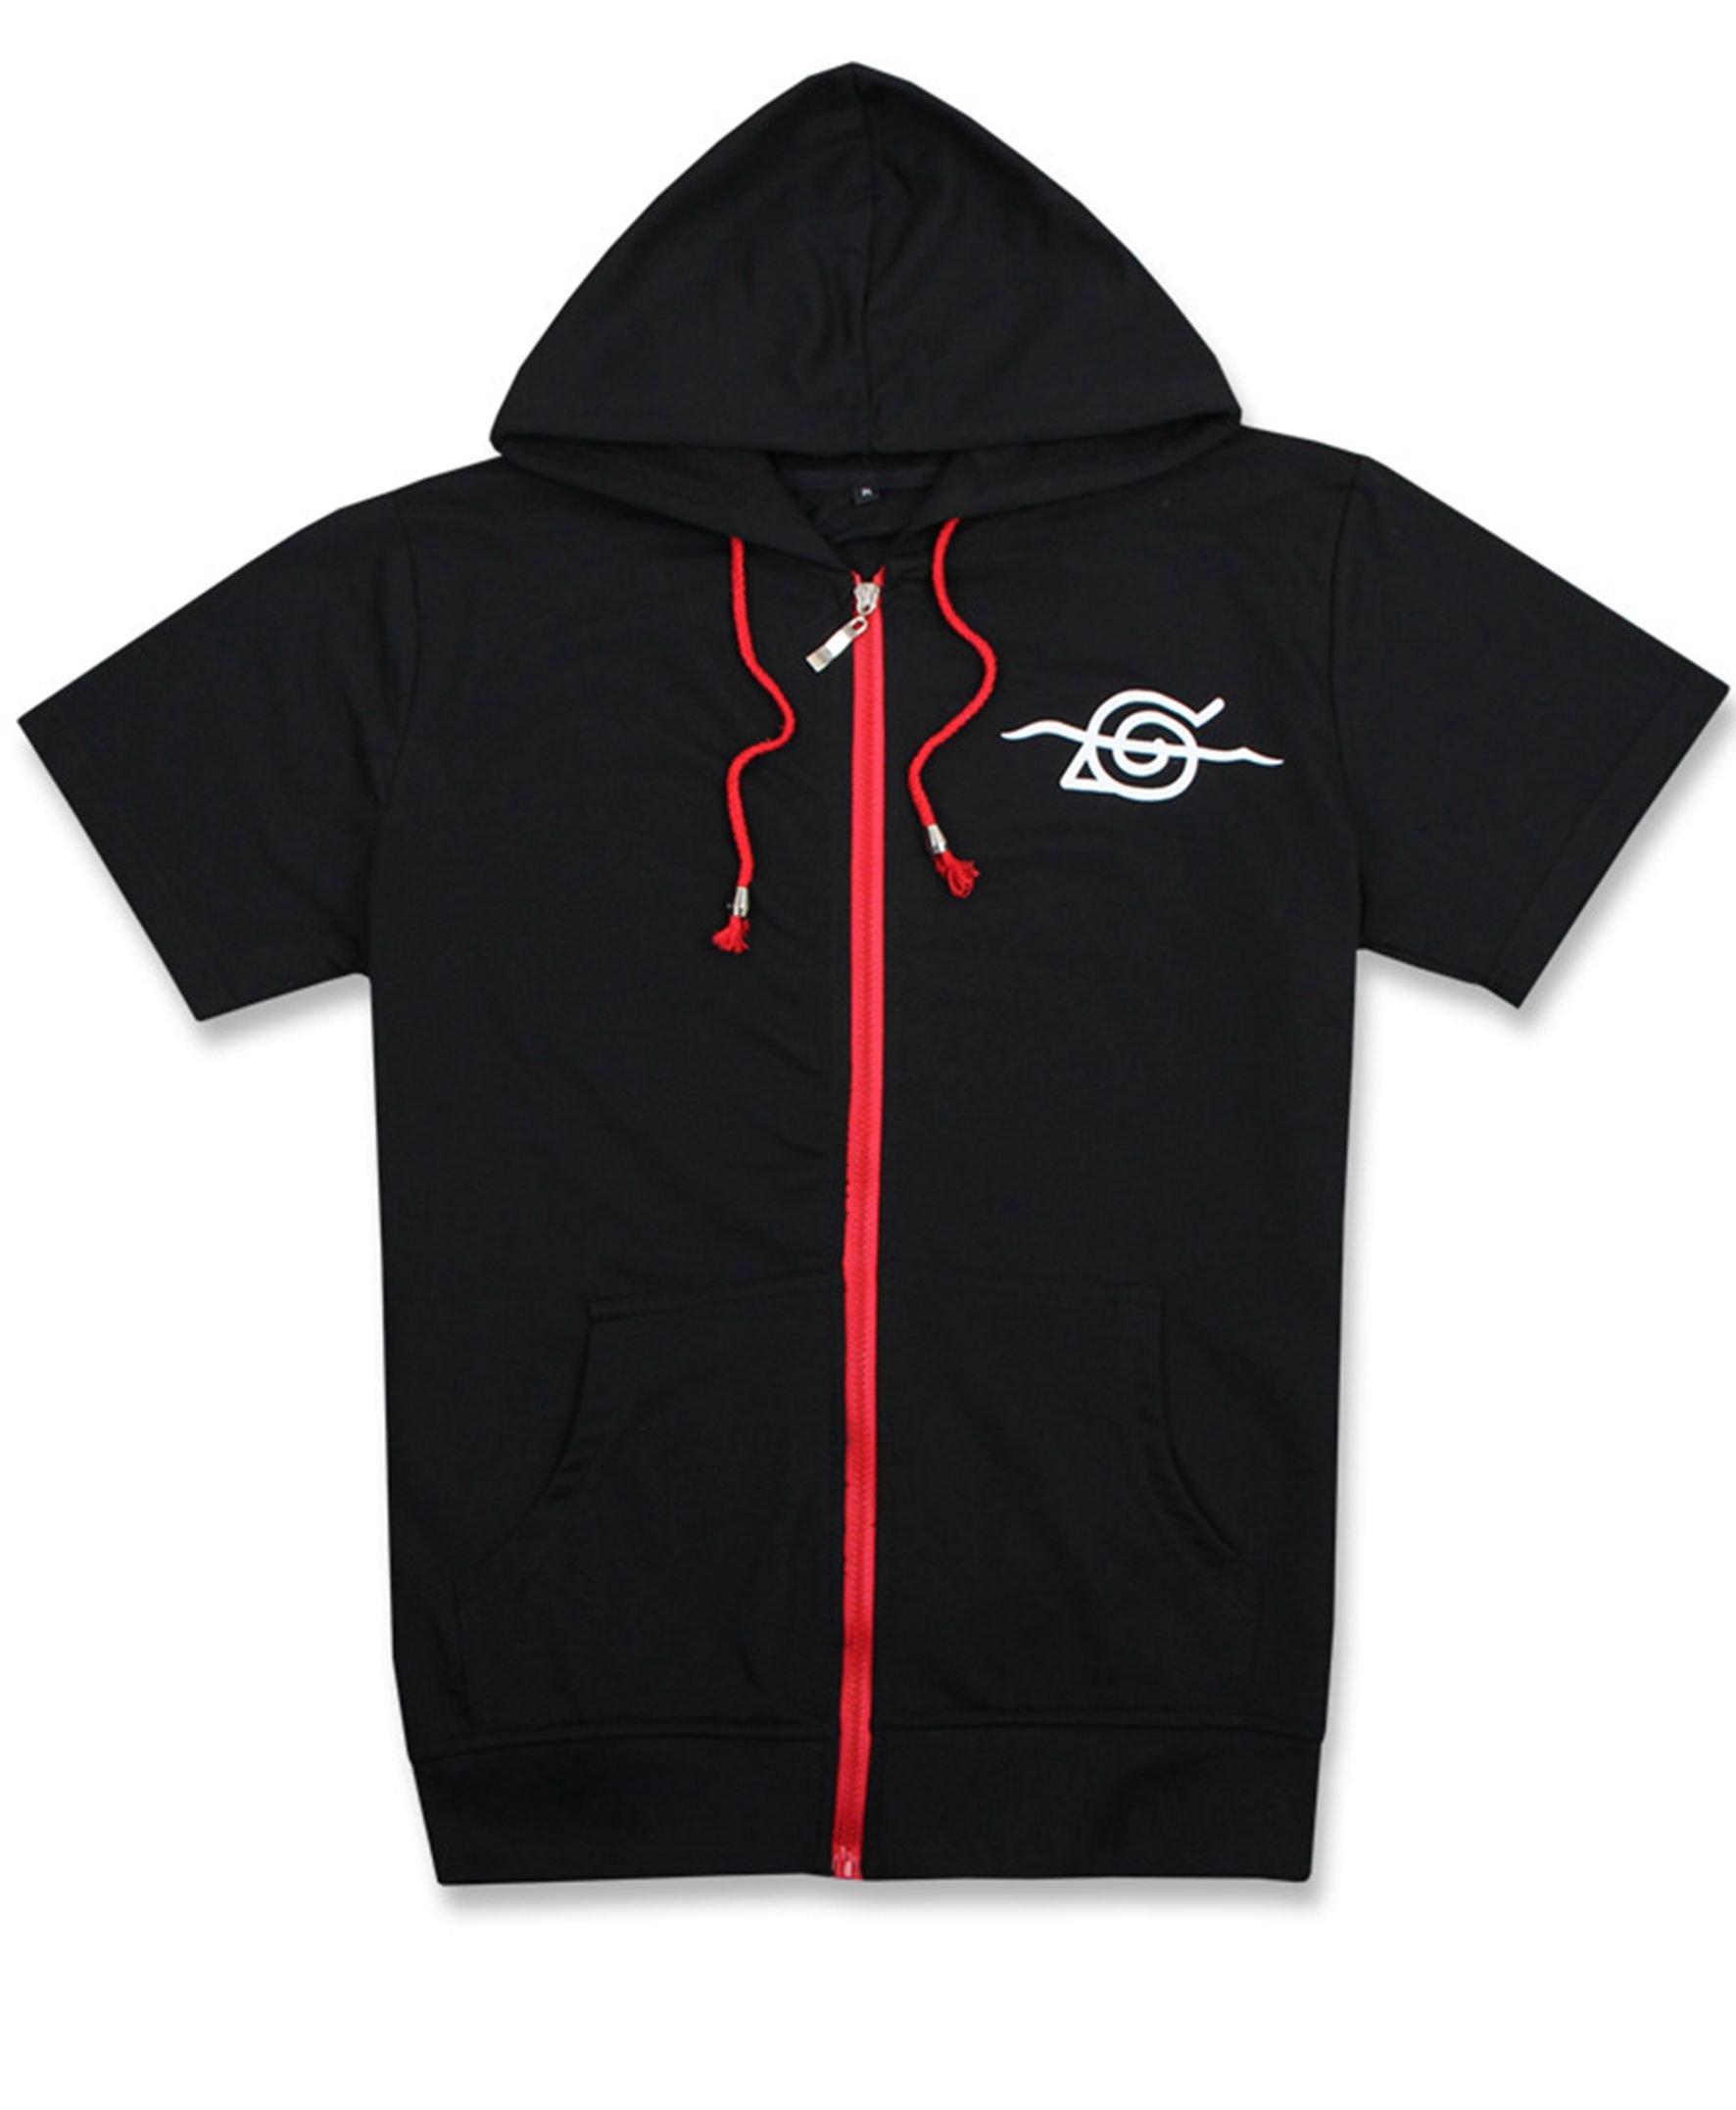 COSAUG Akatsuki Itachi Red Cloud Printed Cosplay Hoodie Short Sleeves Coat Jacket (M) by COSAUG